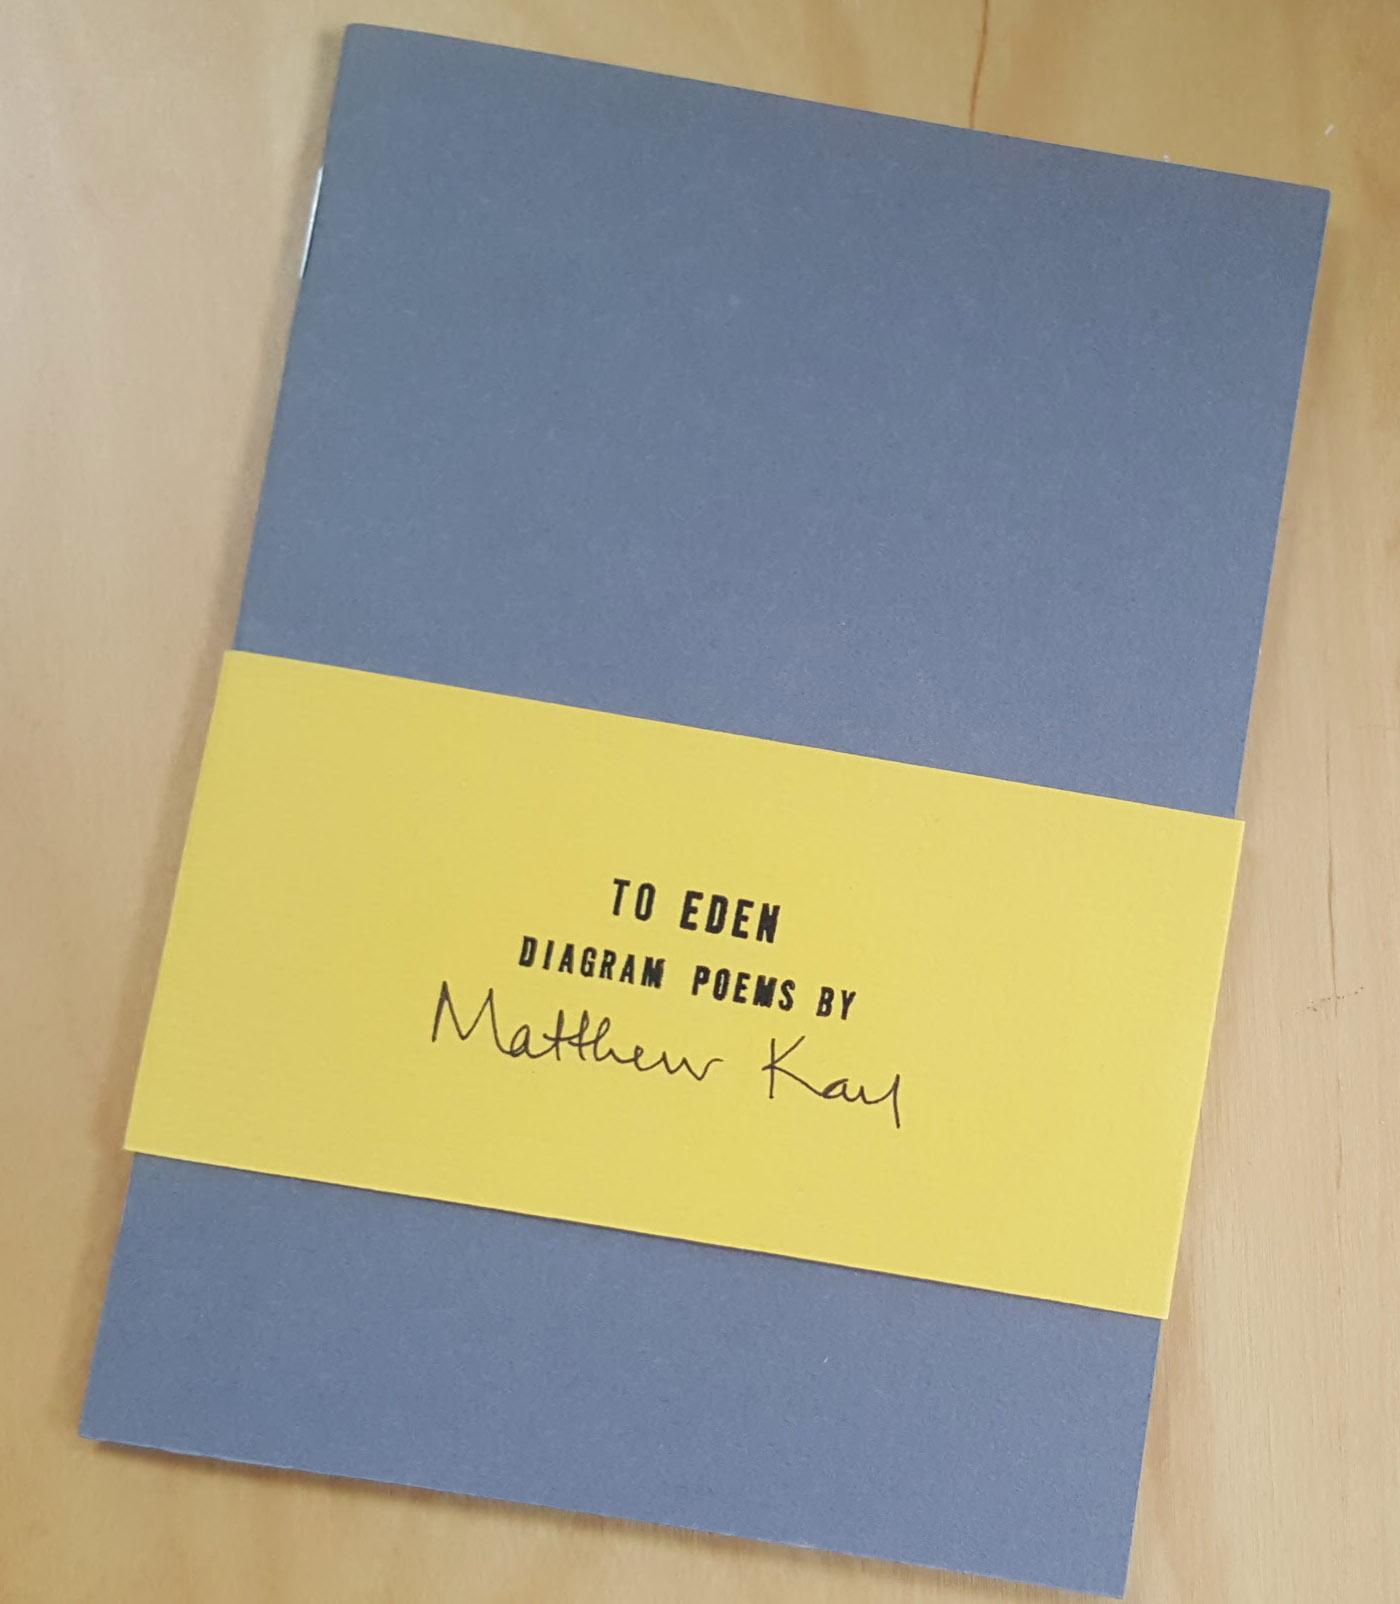 To Eden by Matthew Kay